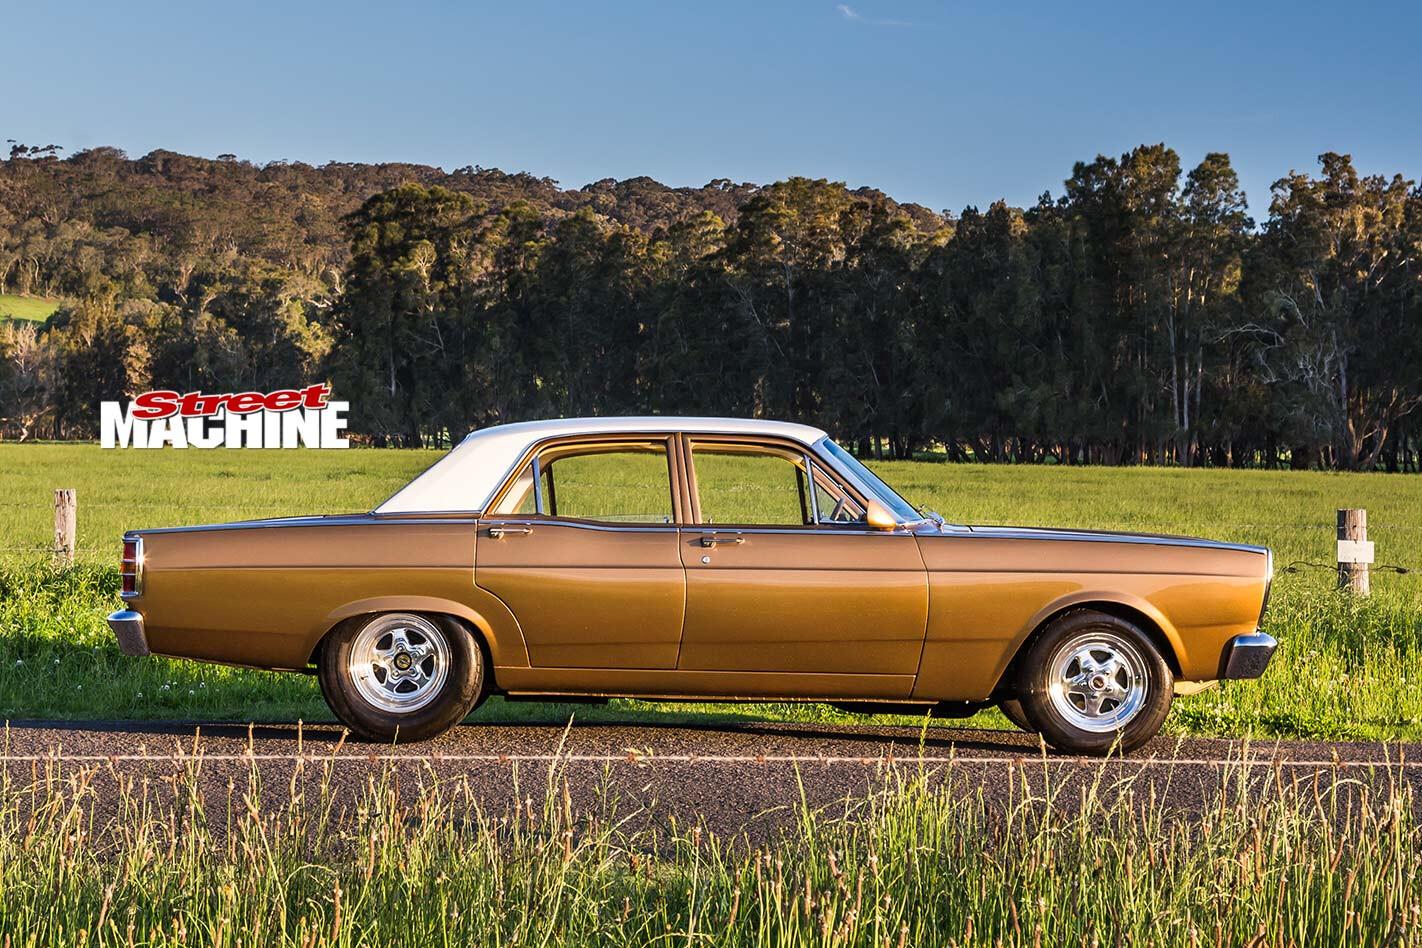 Ford Fairlane ZC side